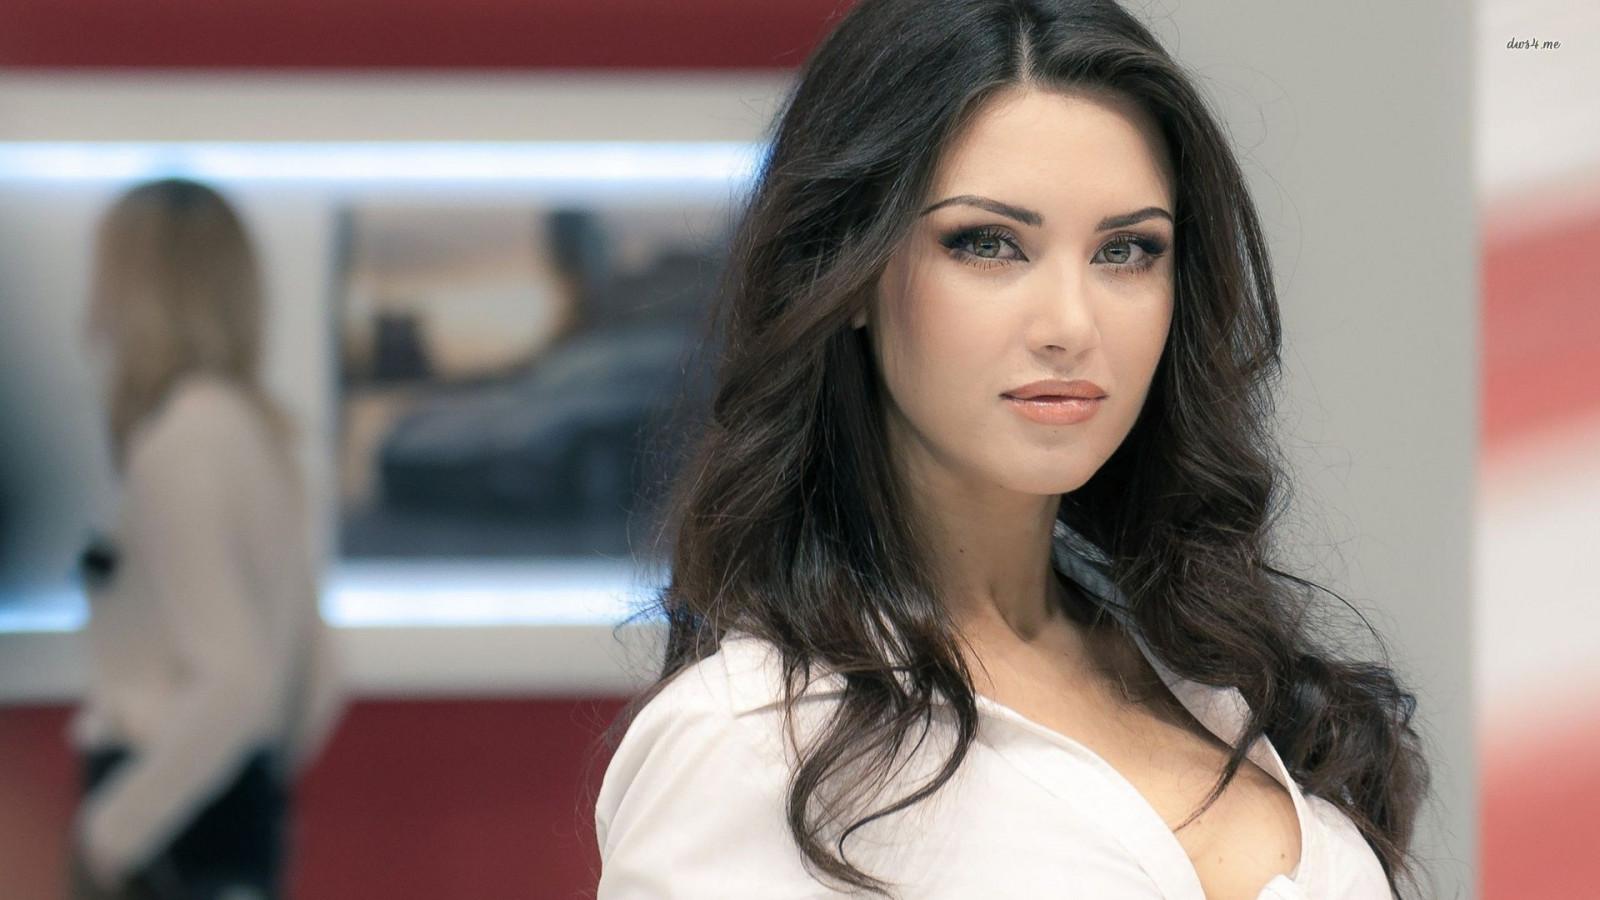 Free Filipino Dating Site. Match Beautiful, Friendly Women Beautiful spanish girls photos